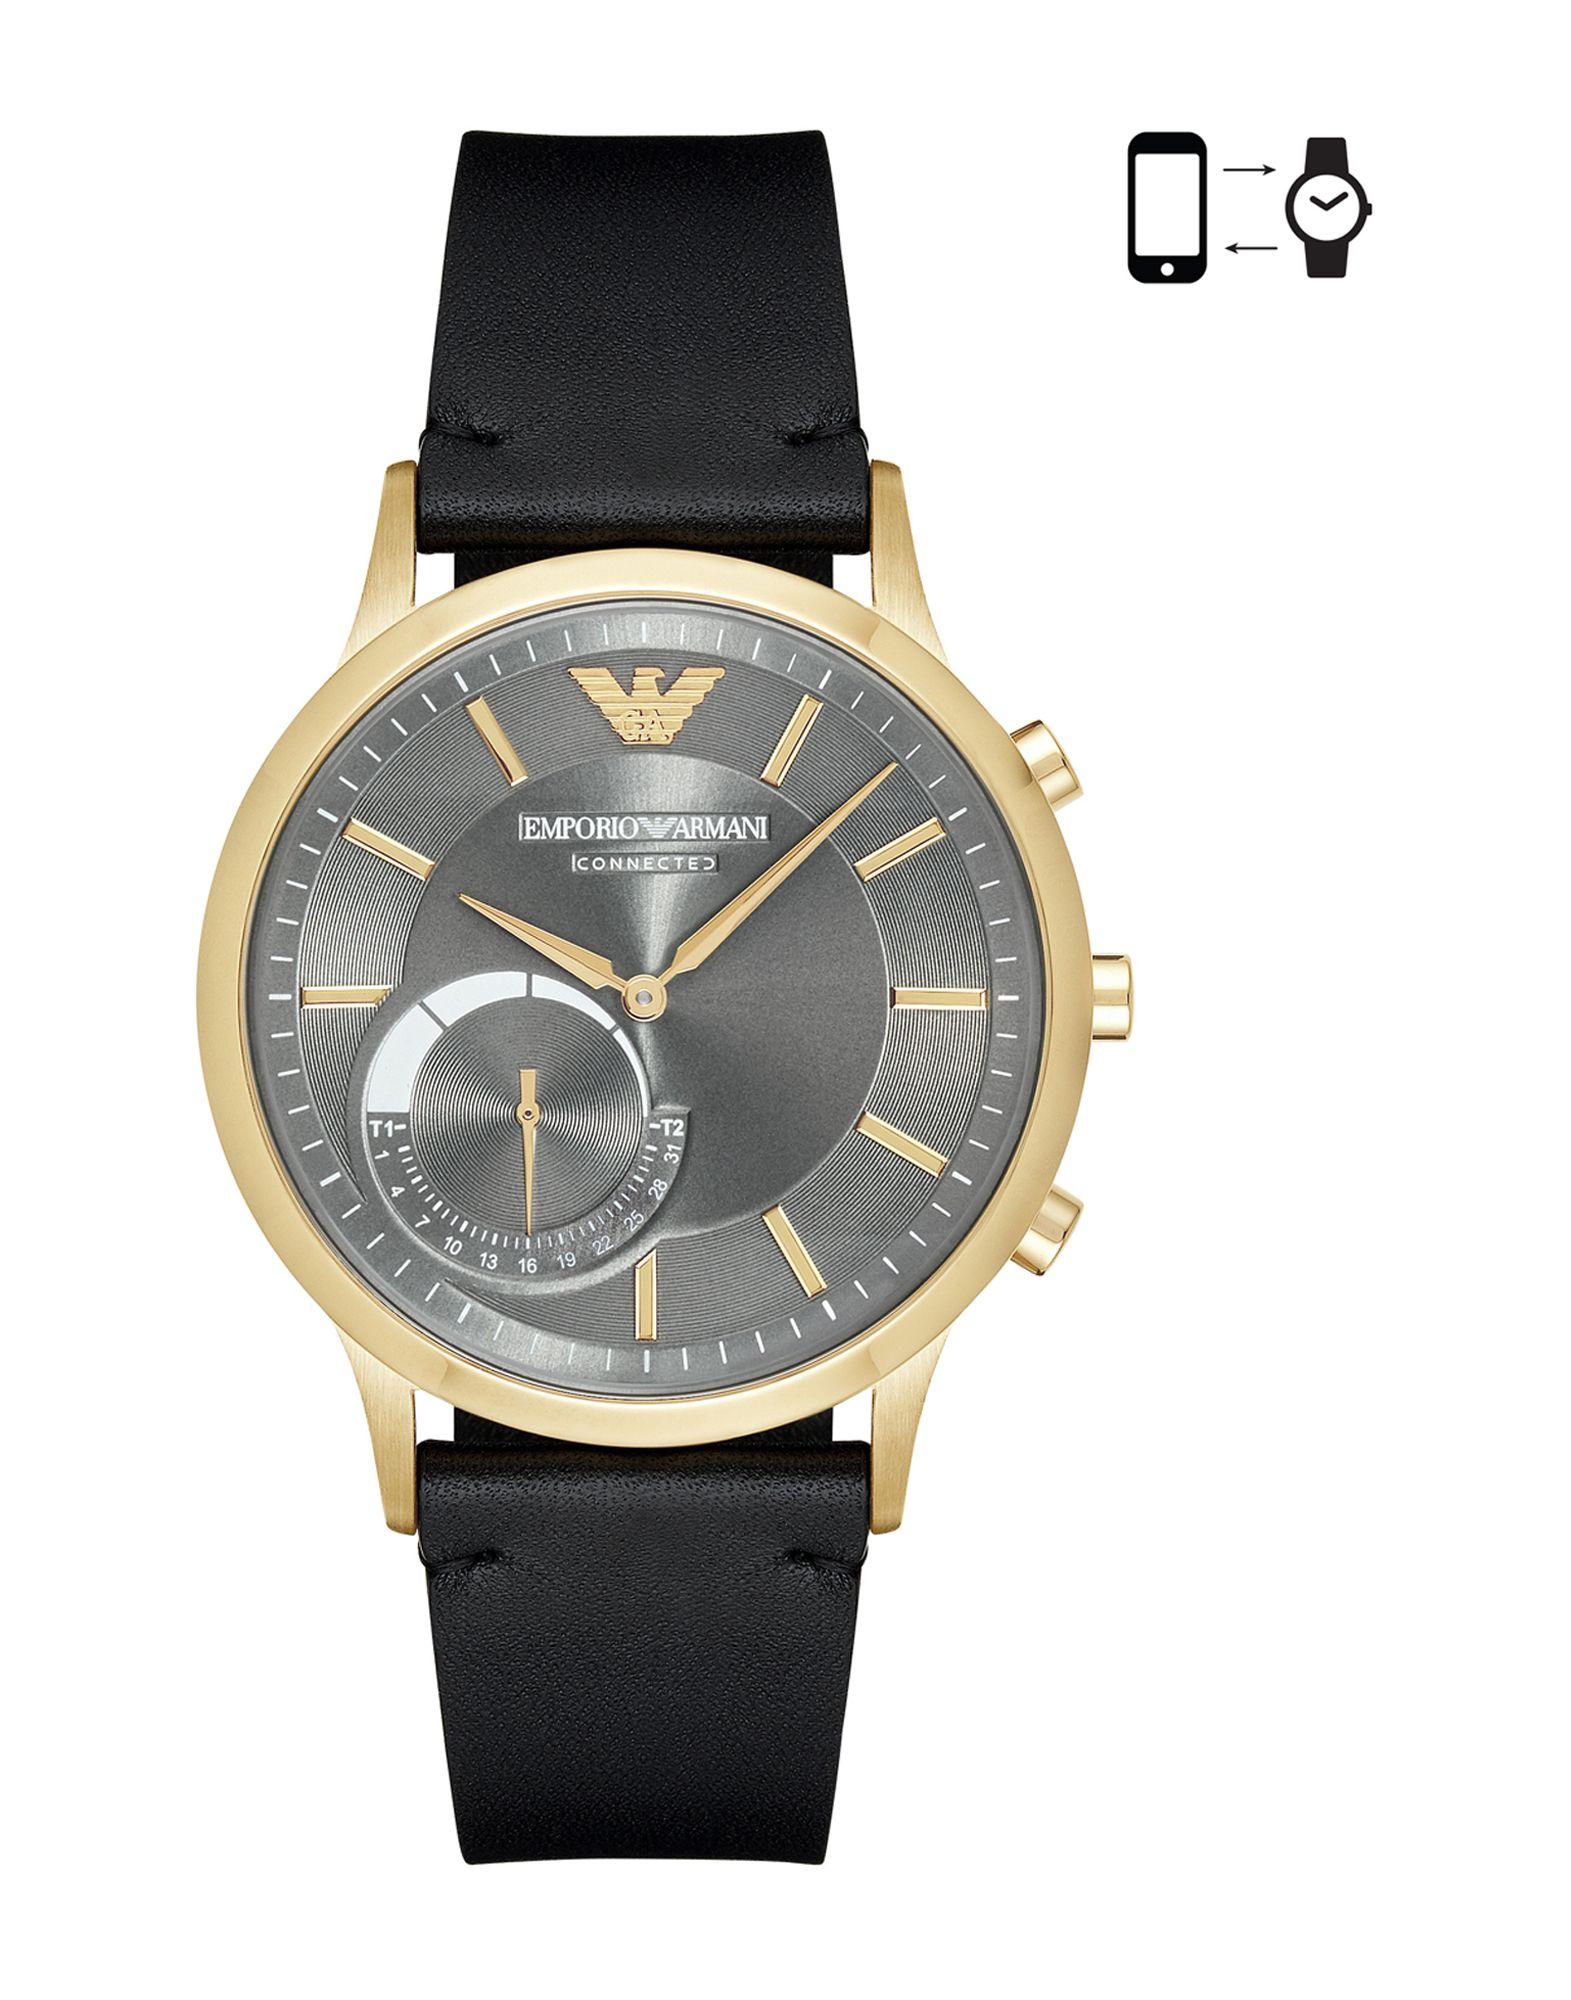 EMPORIO ARMANI CONNECTED Herren Smartwatch Farbe Granitgrau Größe 1